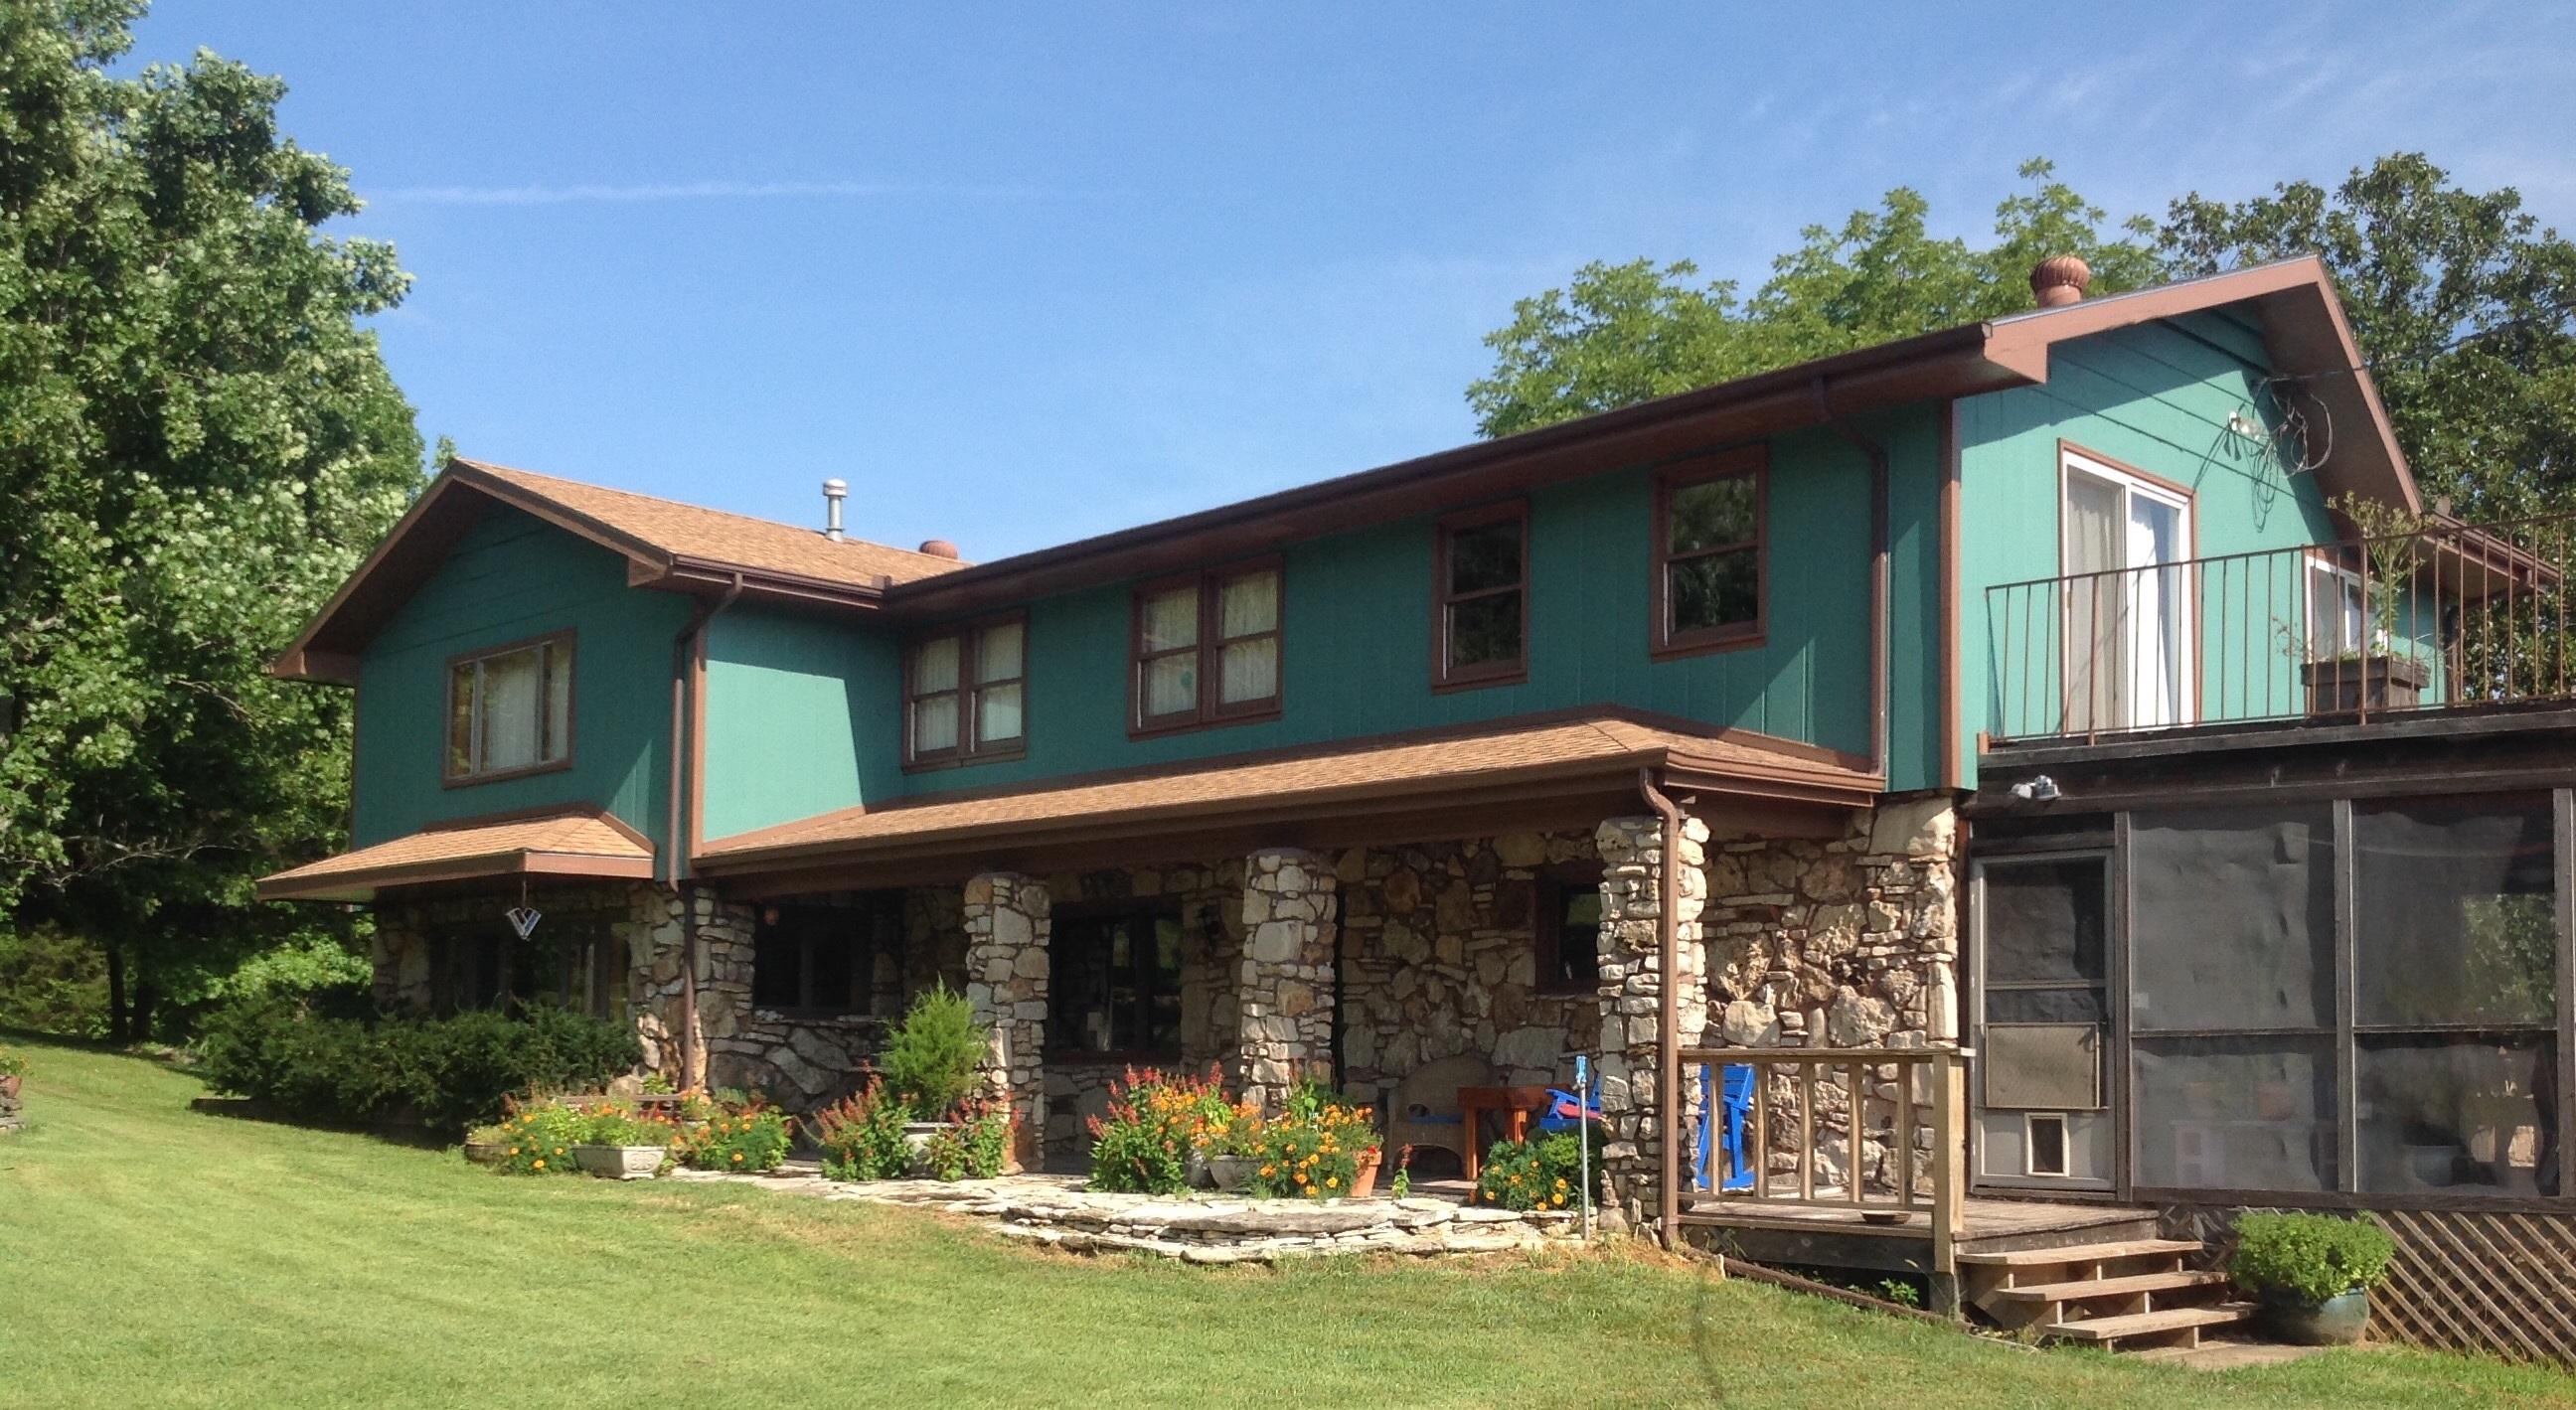 10463 Farm Road 1182, Aurora, Missouri 65605